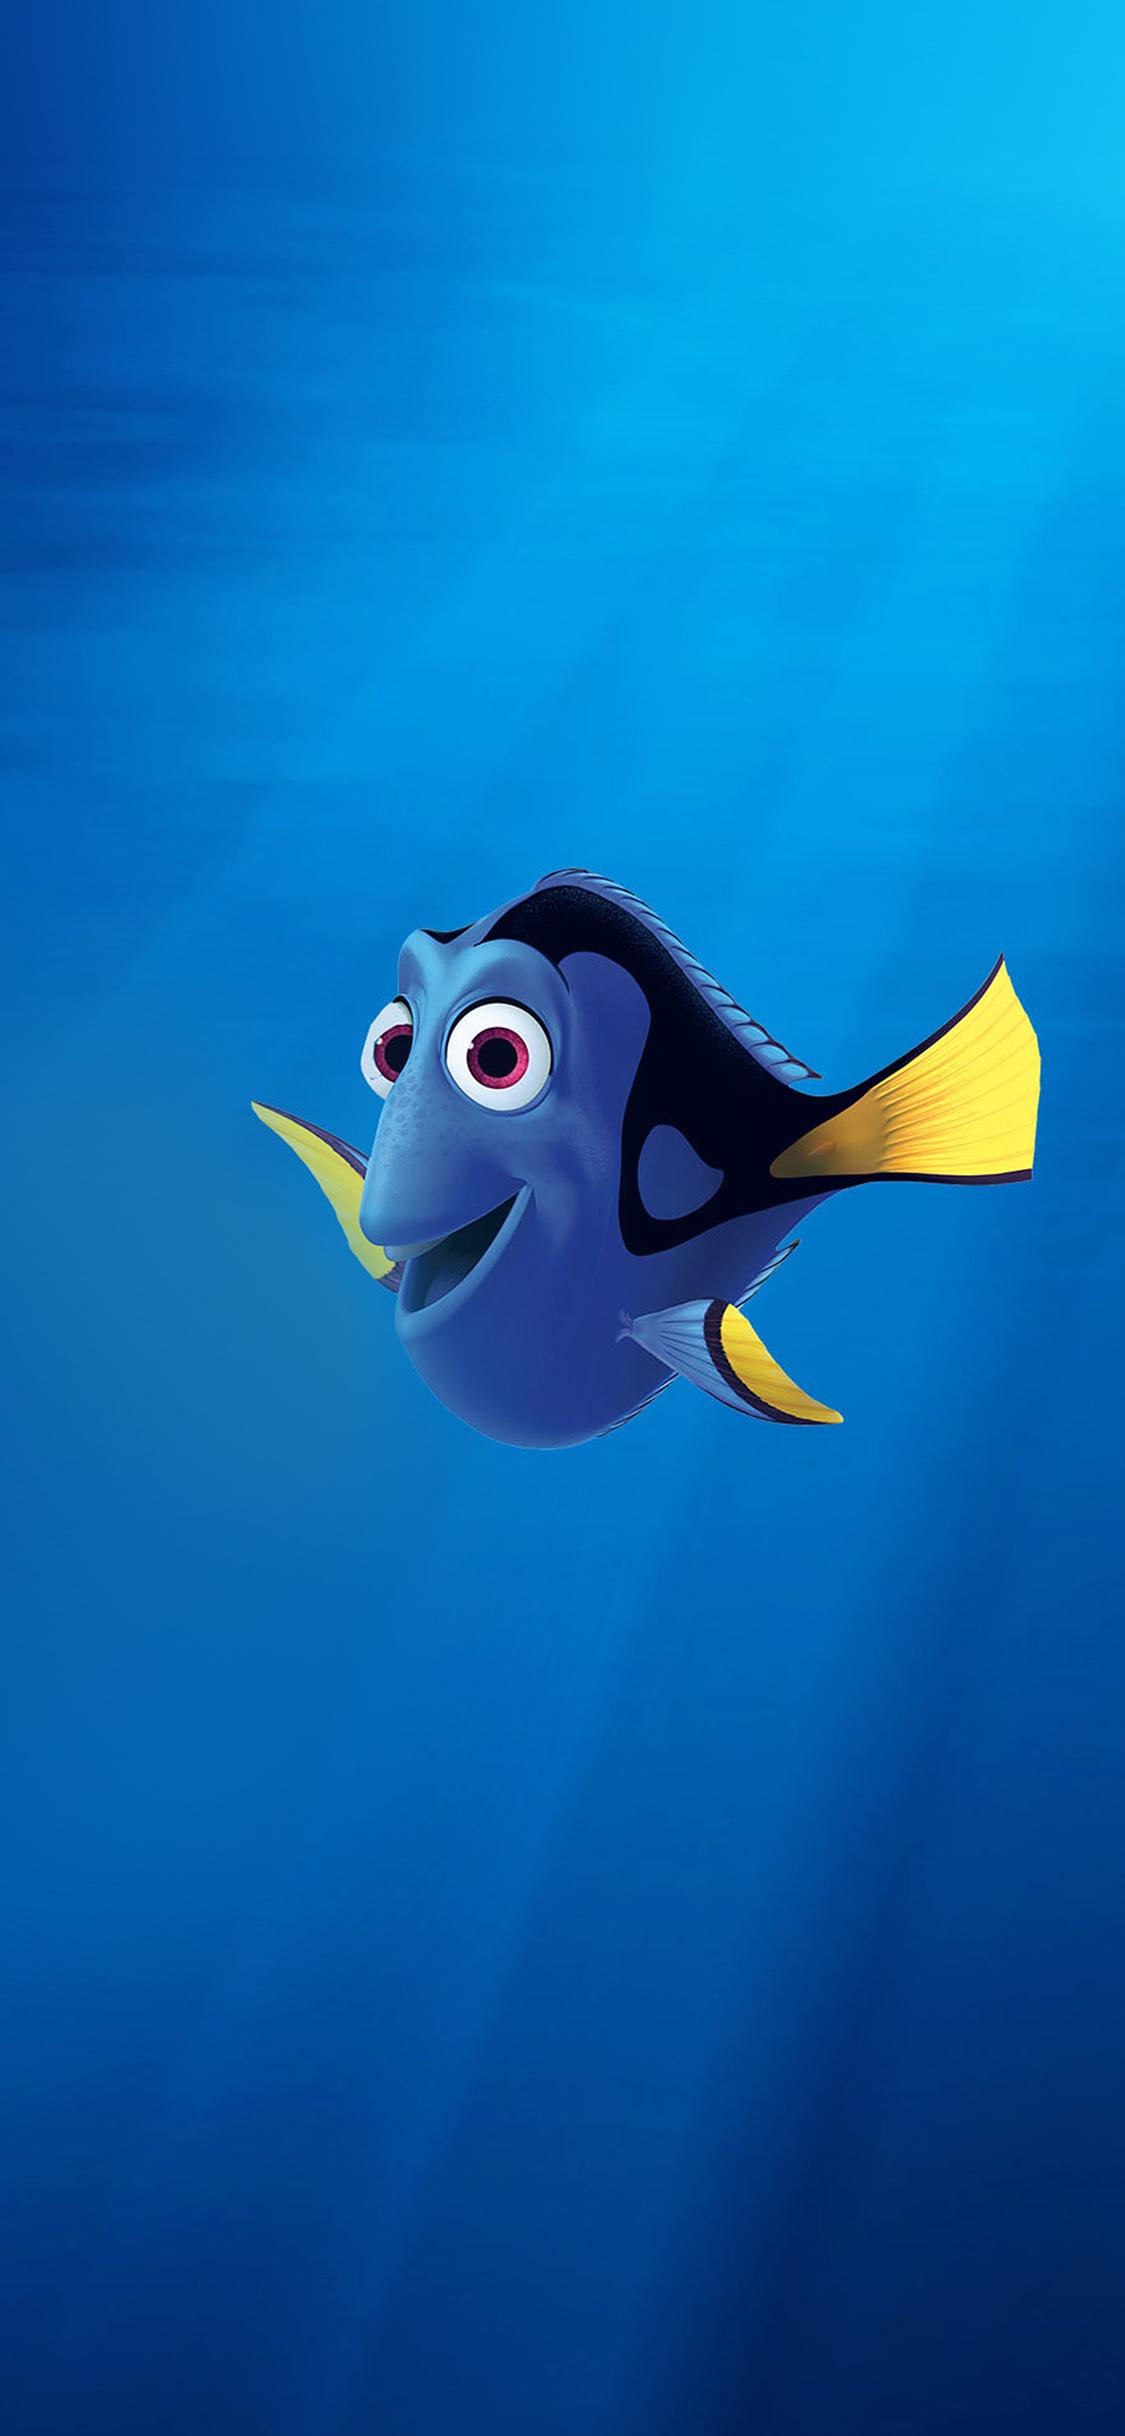 Aq99 Finding Nemo Dory Disney Art Wallpaper